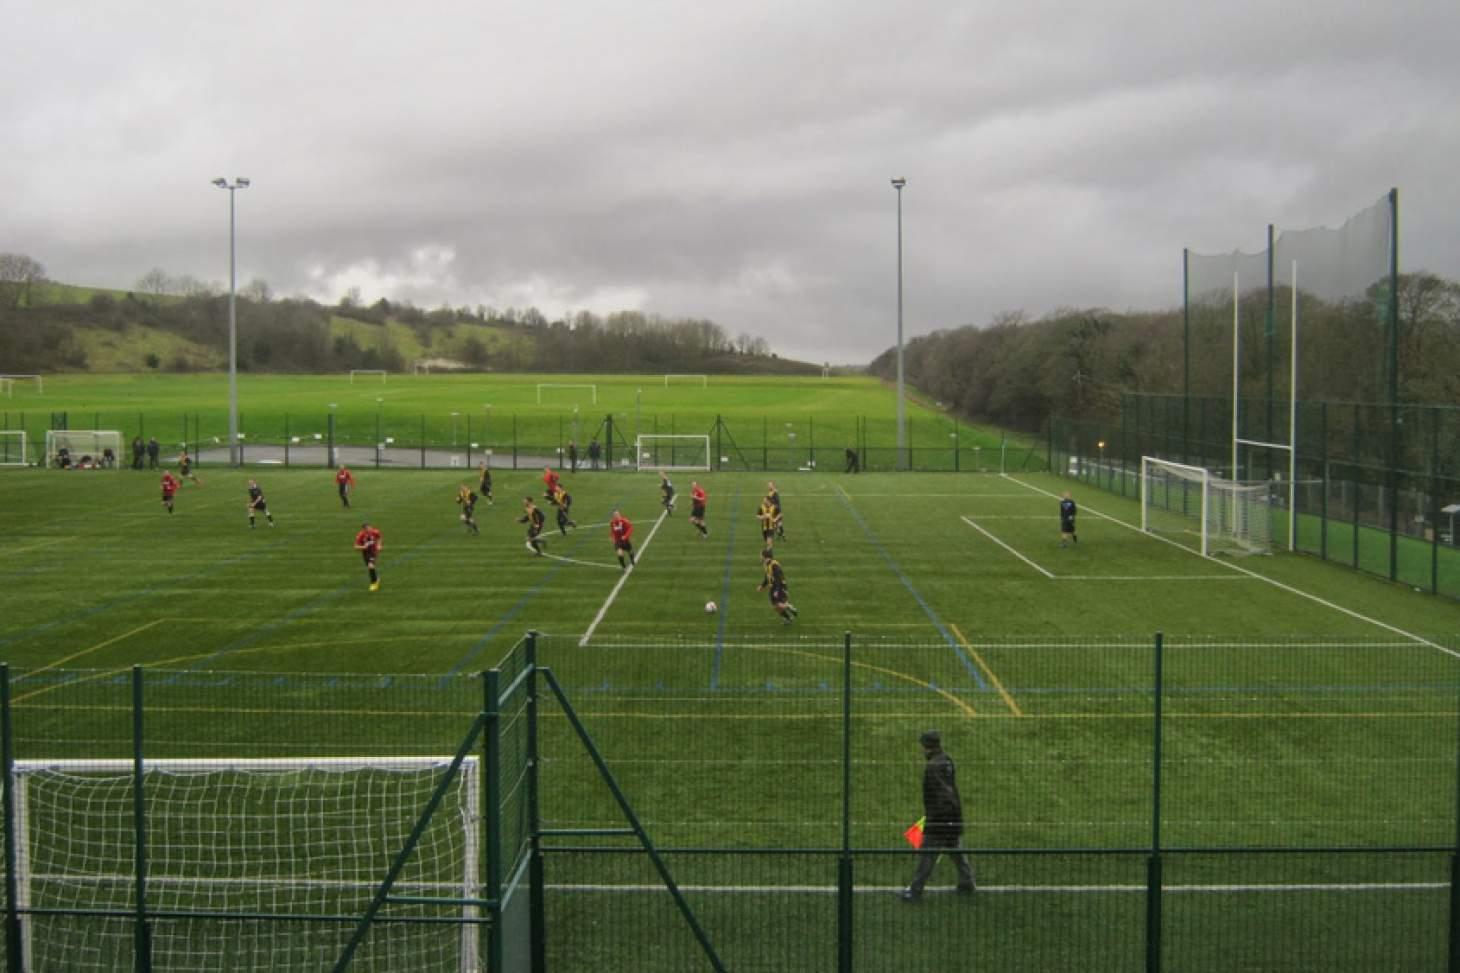 University Of Brighton (Falmer Campus) 7 a side   3G Astroturf football pitch